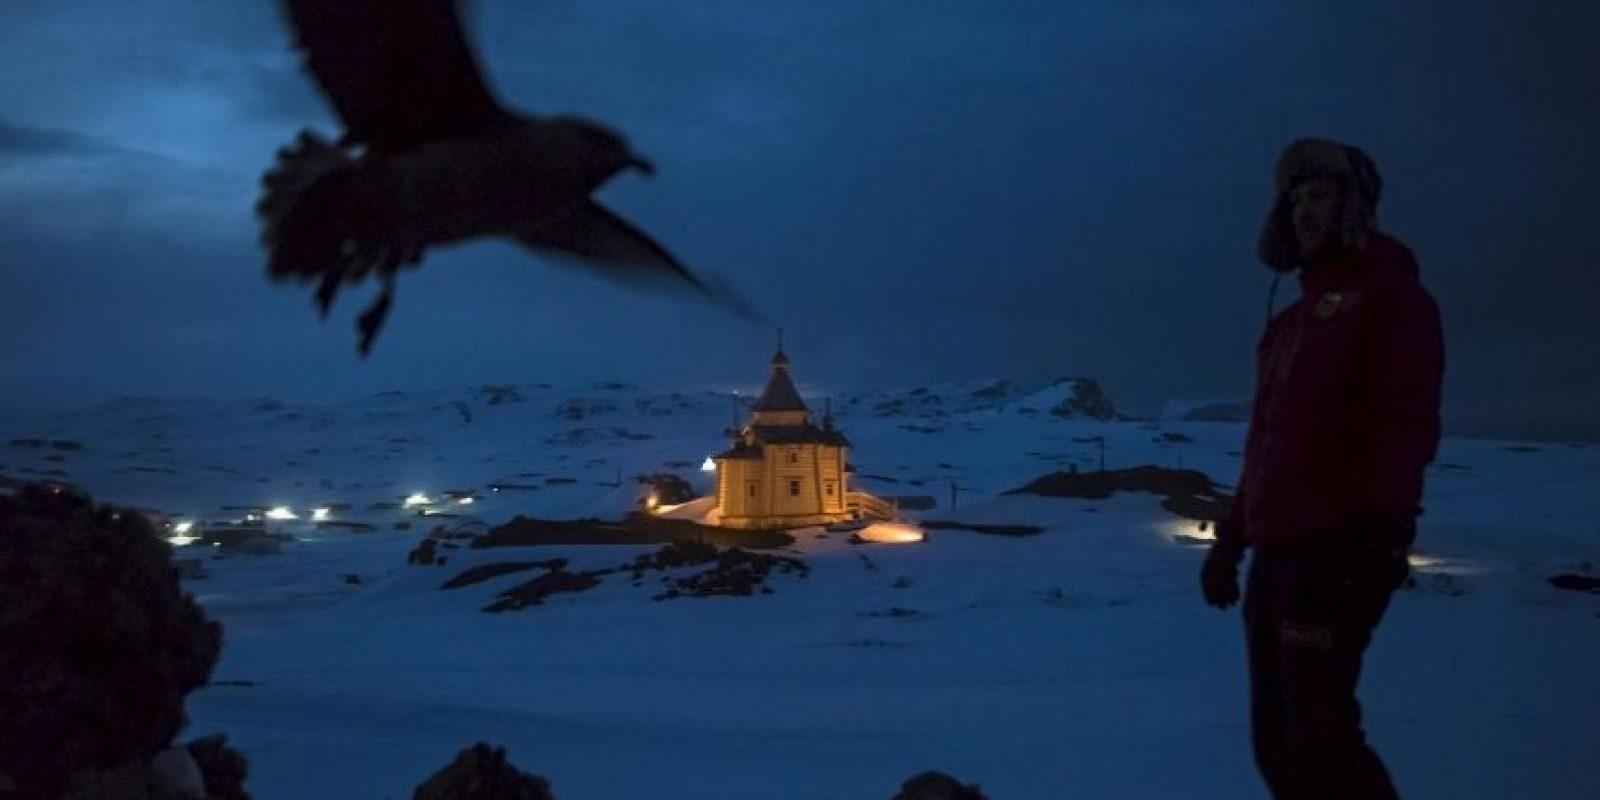 Daniel Berehulak. Un científico chileno camina arriba de la iglesia ortodoxa rusa de la Santísima Trinidad. Foto:worldpressphoto.org